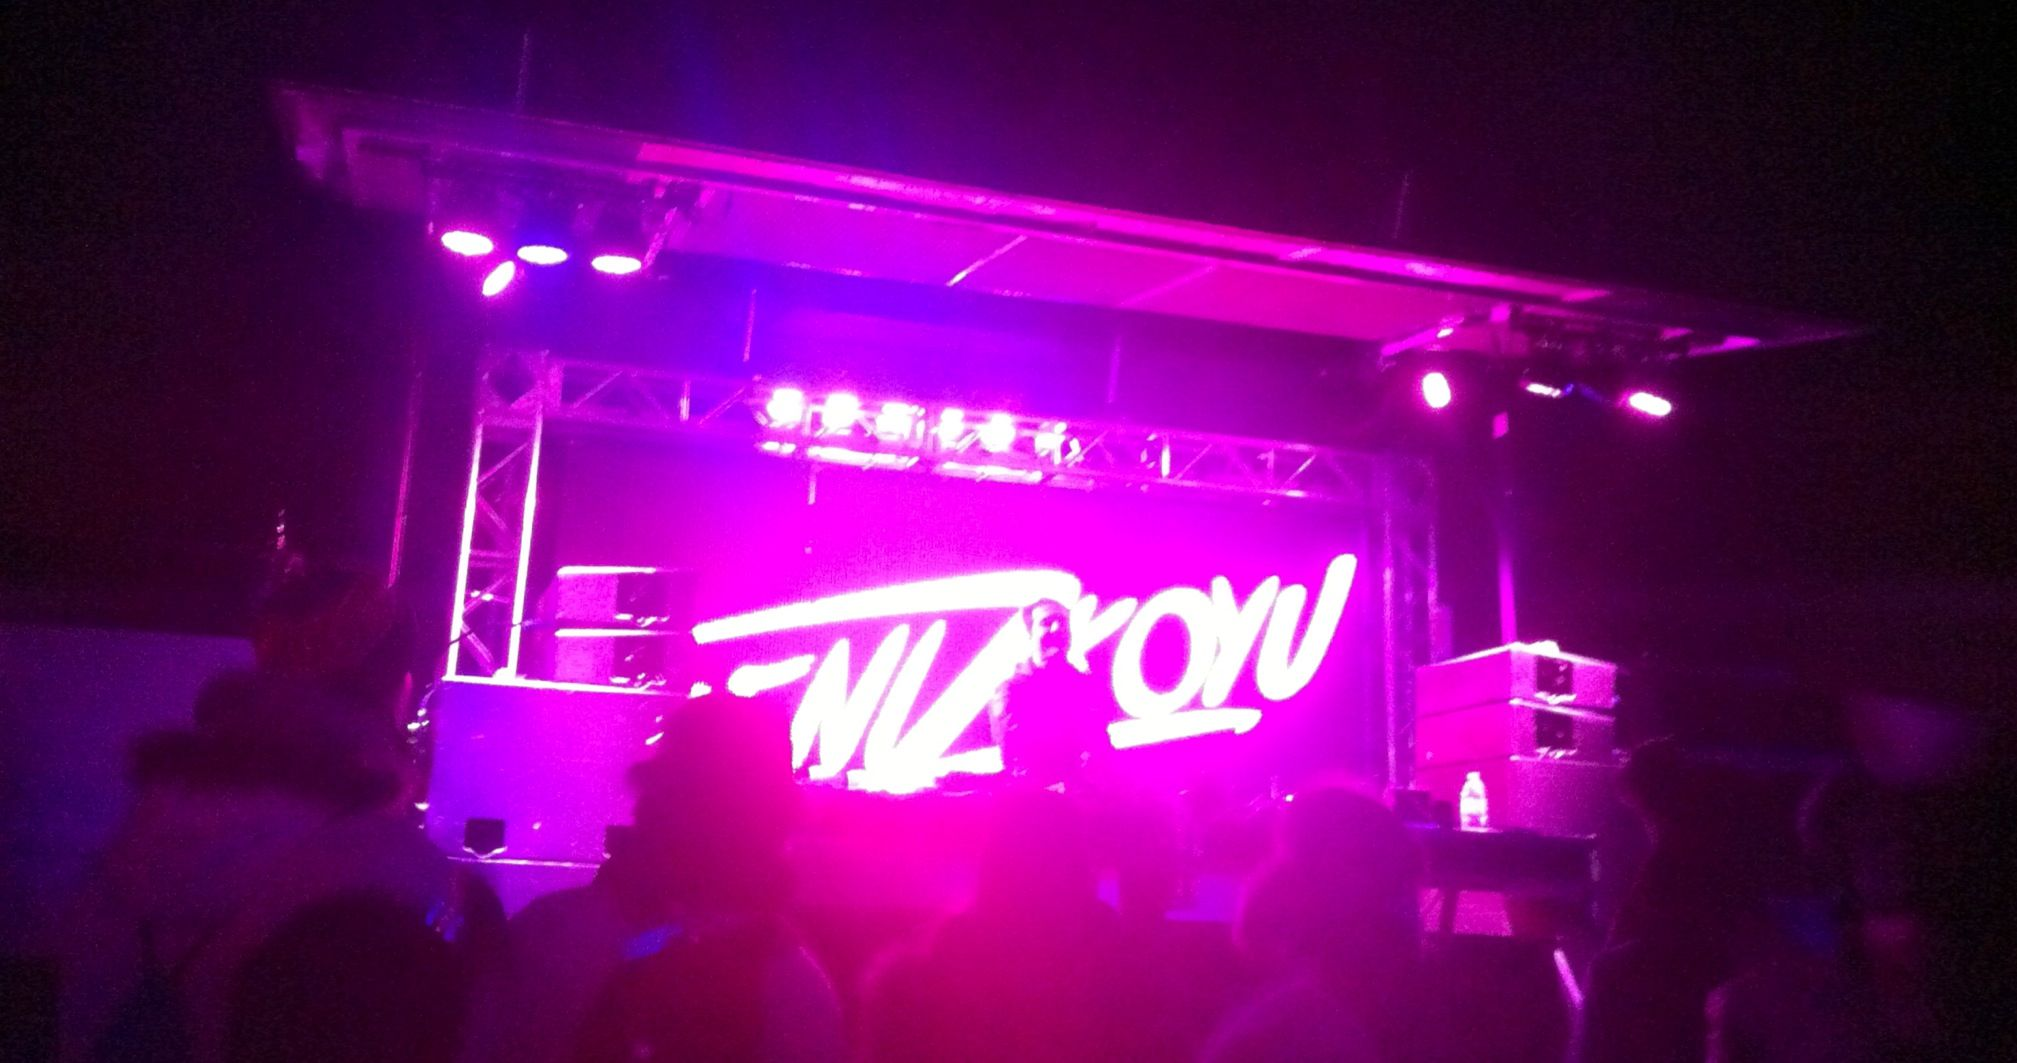 Deniz Koyu lights up the Red Bull Tour Bus! Winter music